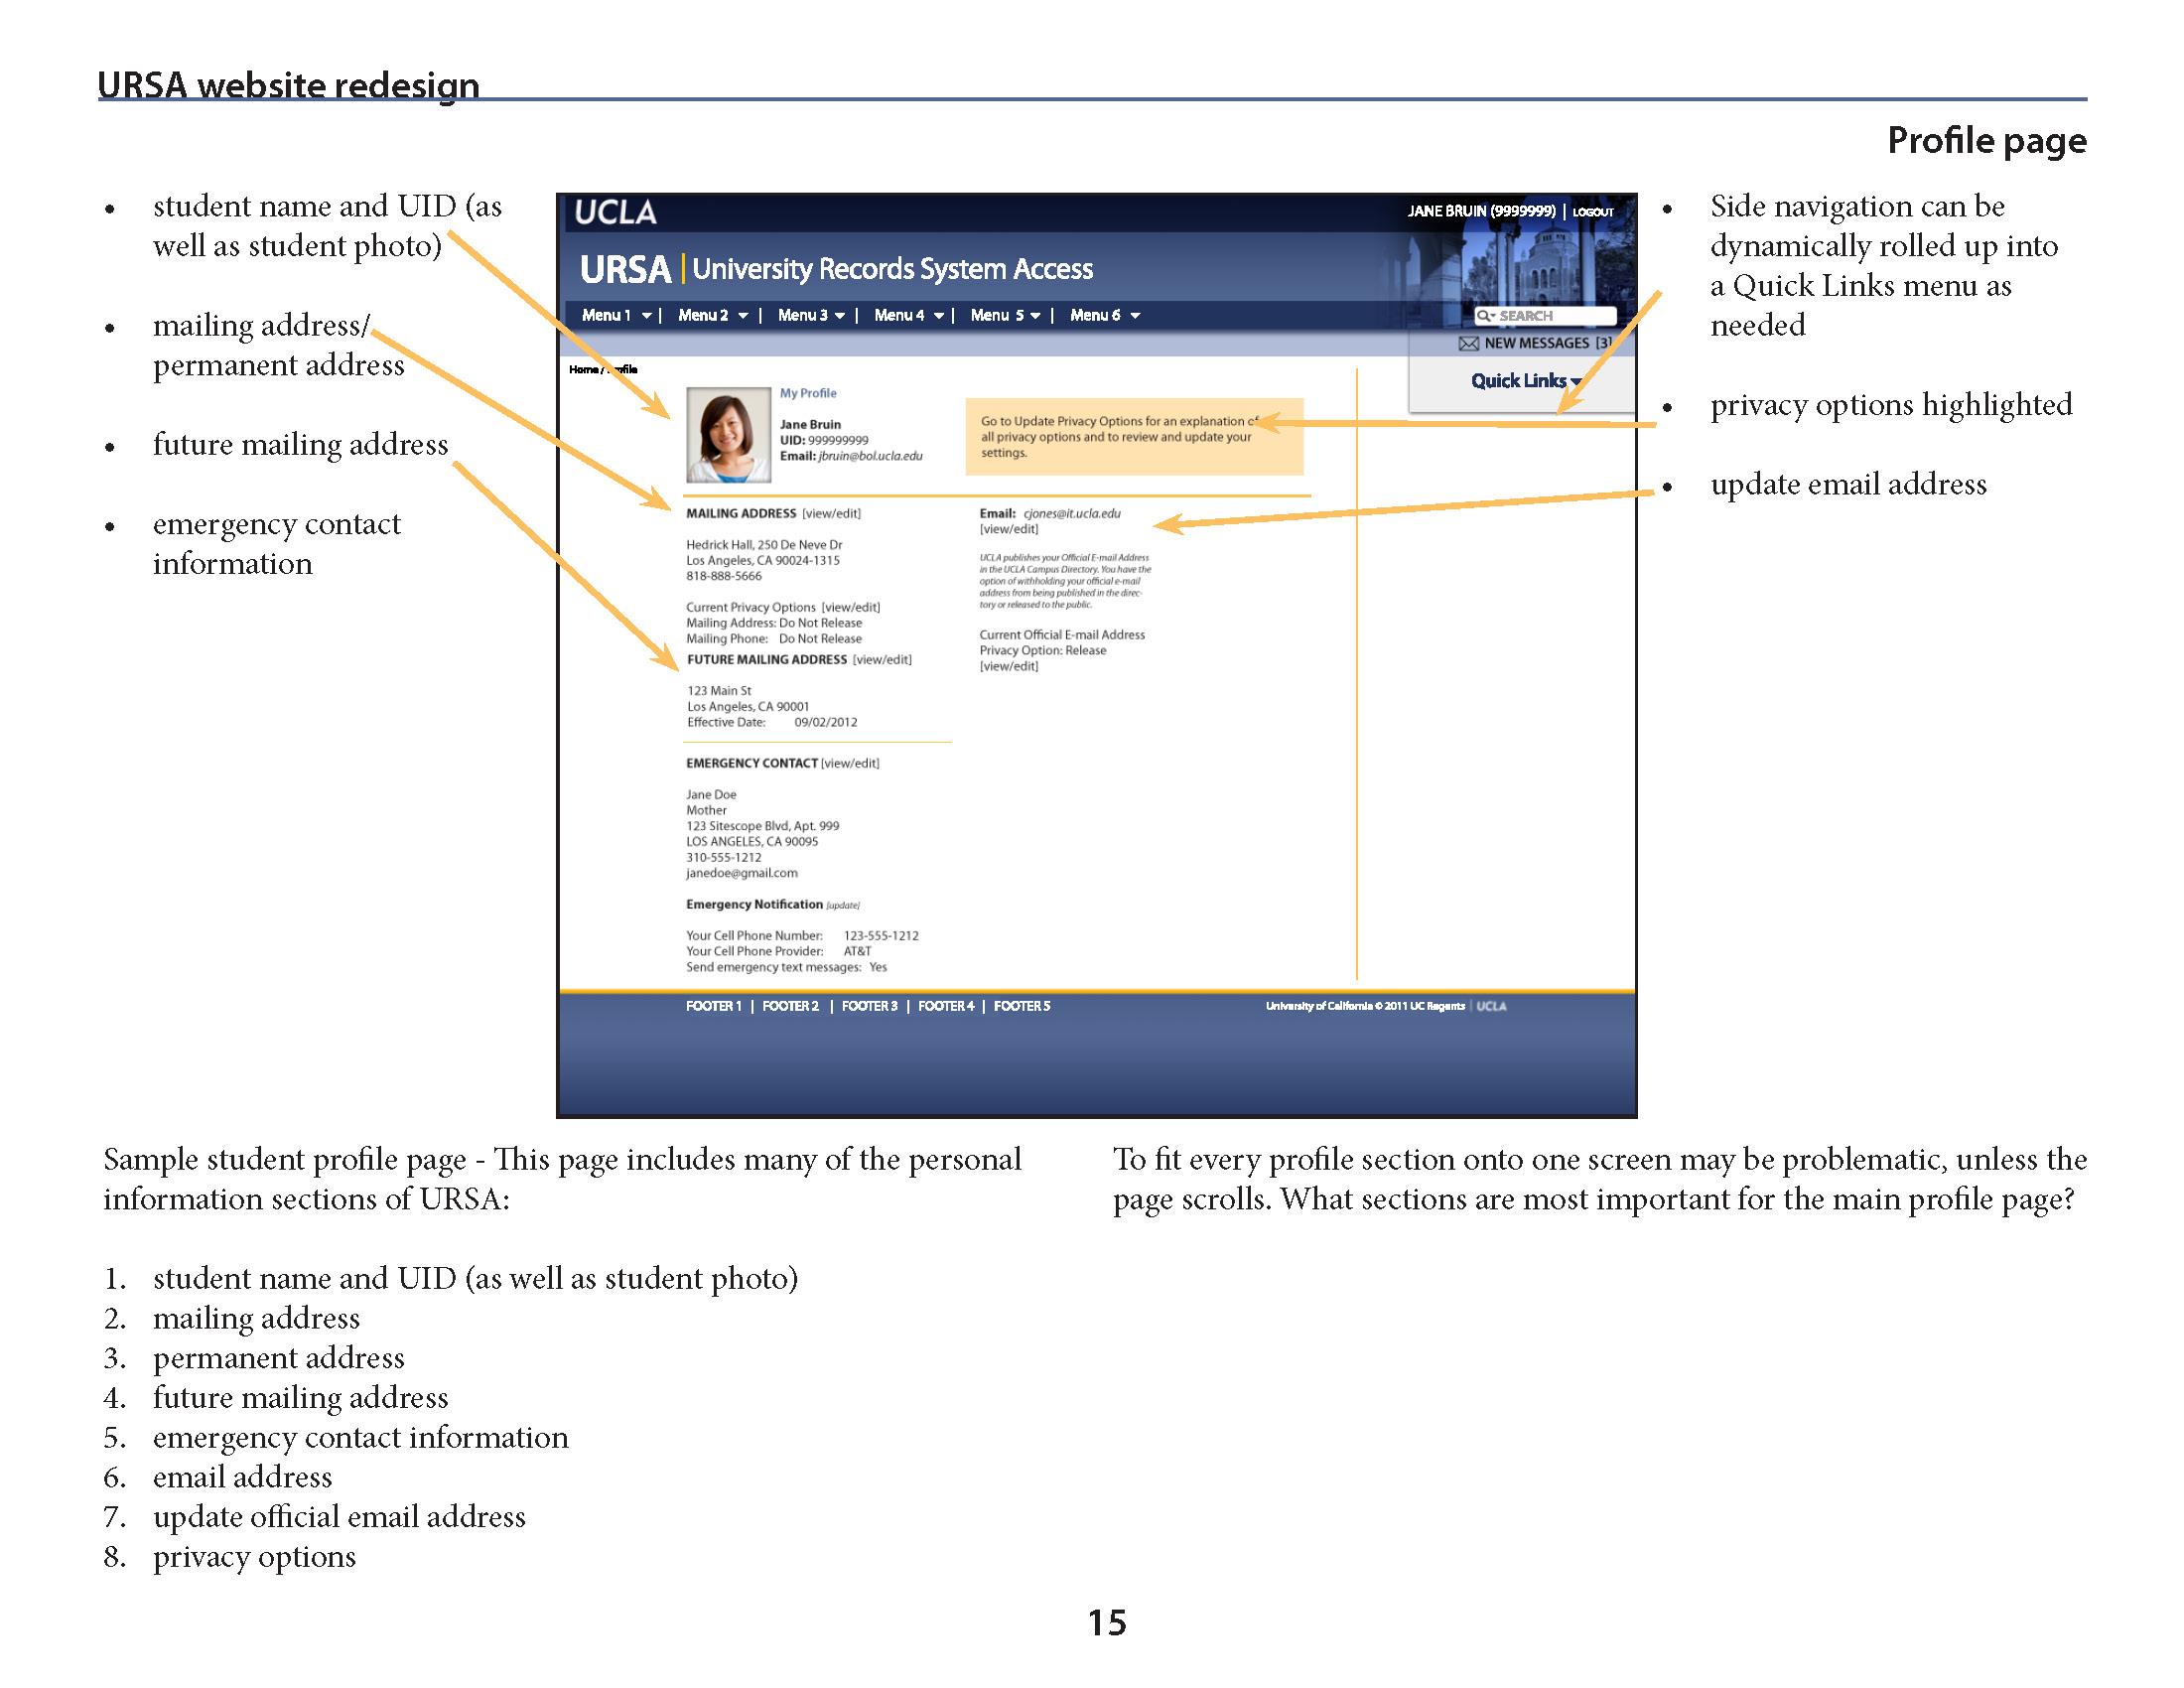 redesign-presentation_v4_Page_15.jpg